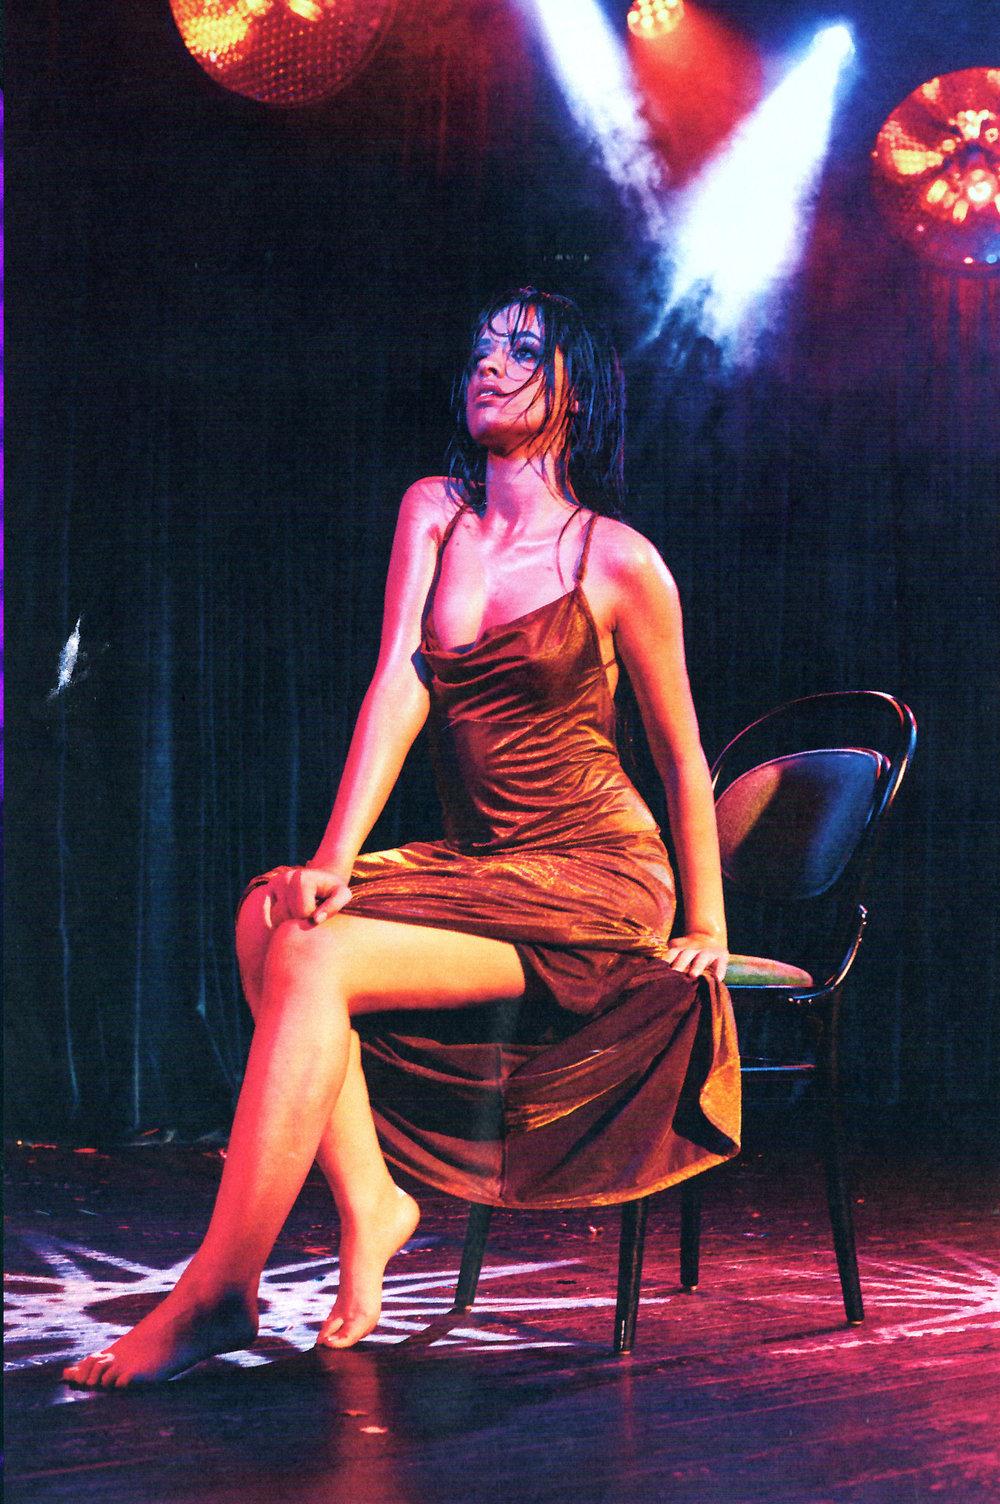 Brigitte Nielsen Nude Pics and Videos - - Top